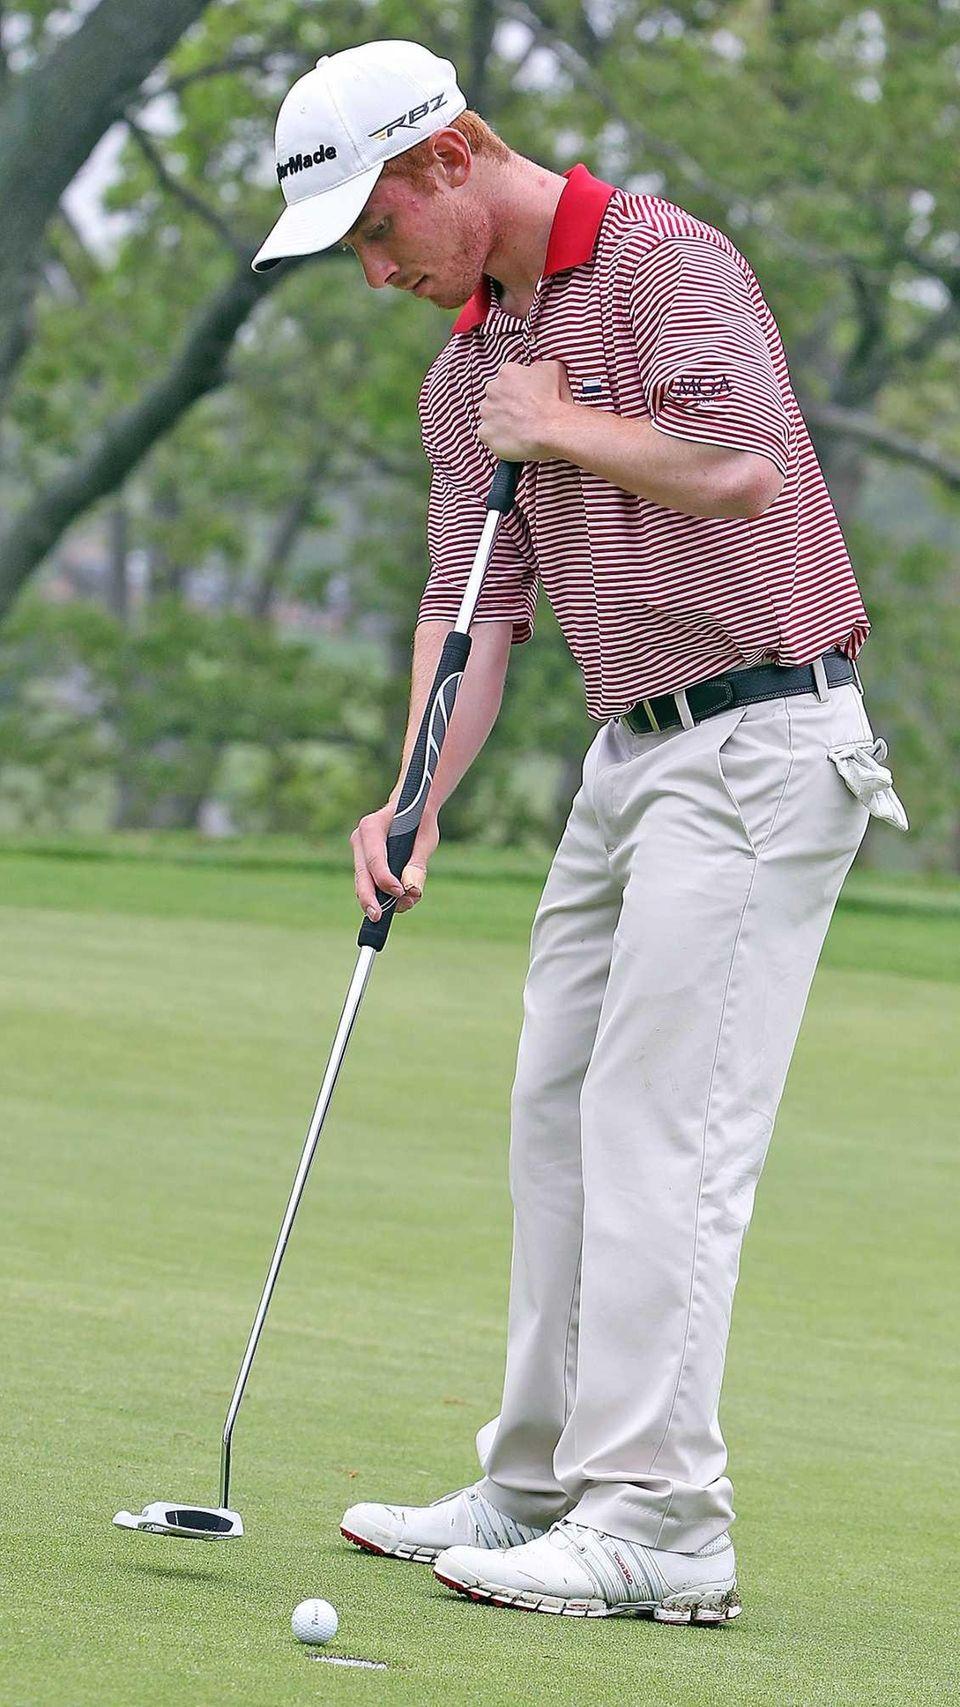 Farmingdale's Matt Lowe putts the ball during the